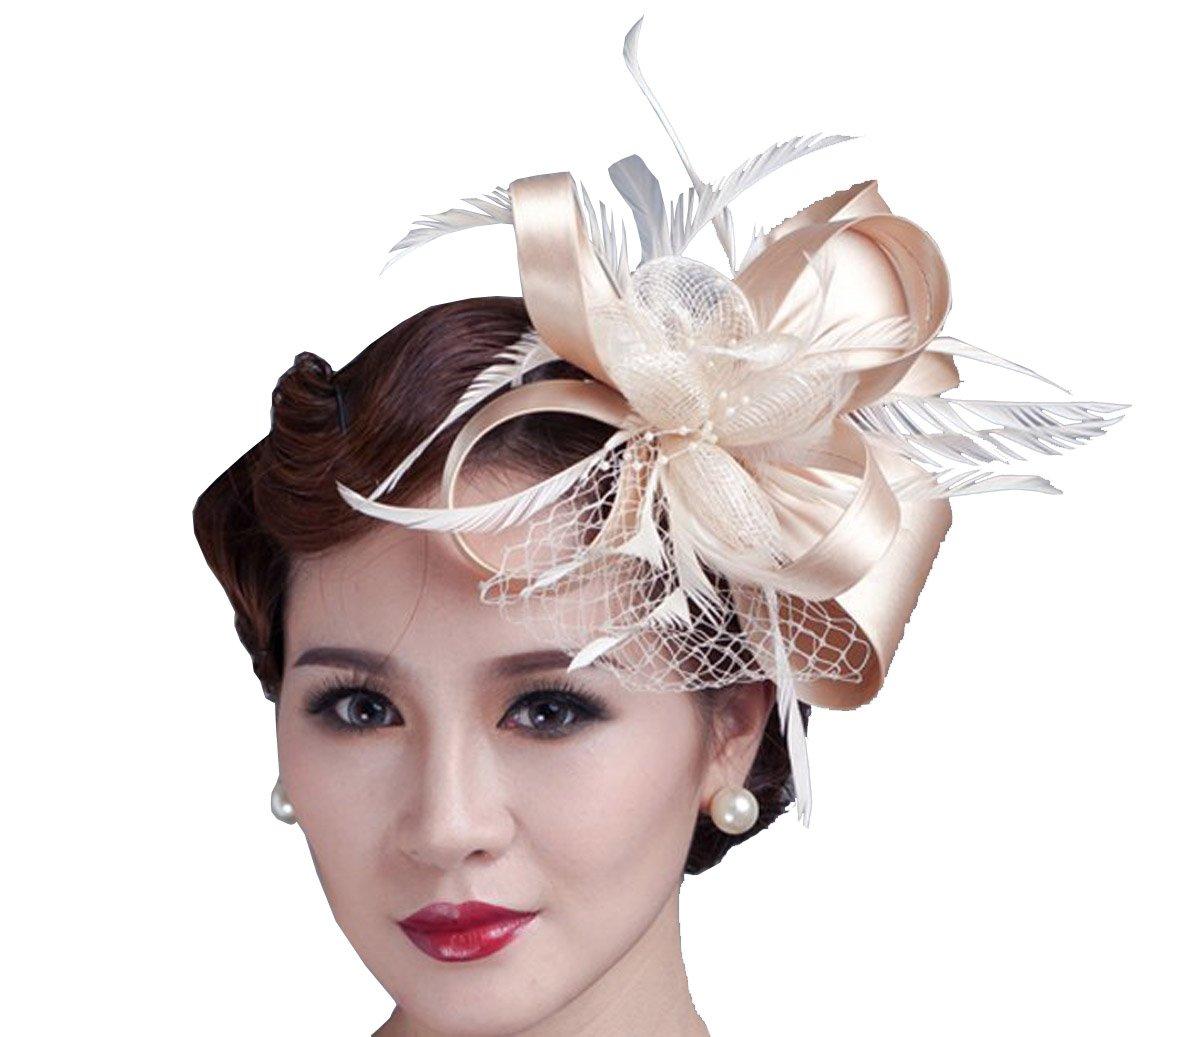 Sheliky Fascinator Flower Cocktail Party Headdress Wedding Bridal Headpiece for Women (Champagne)